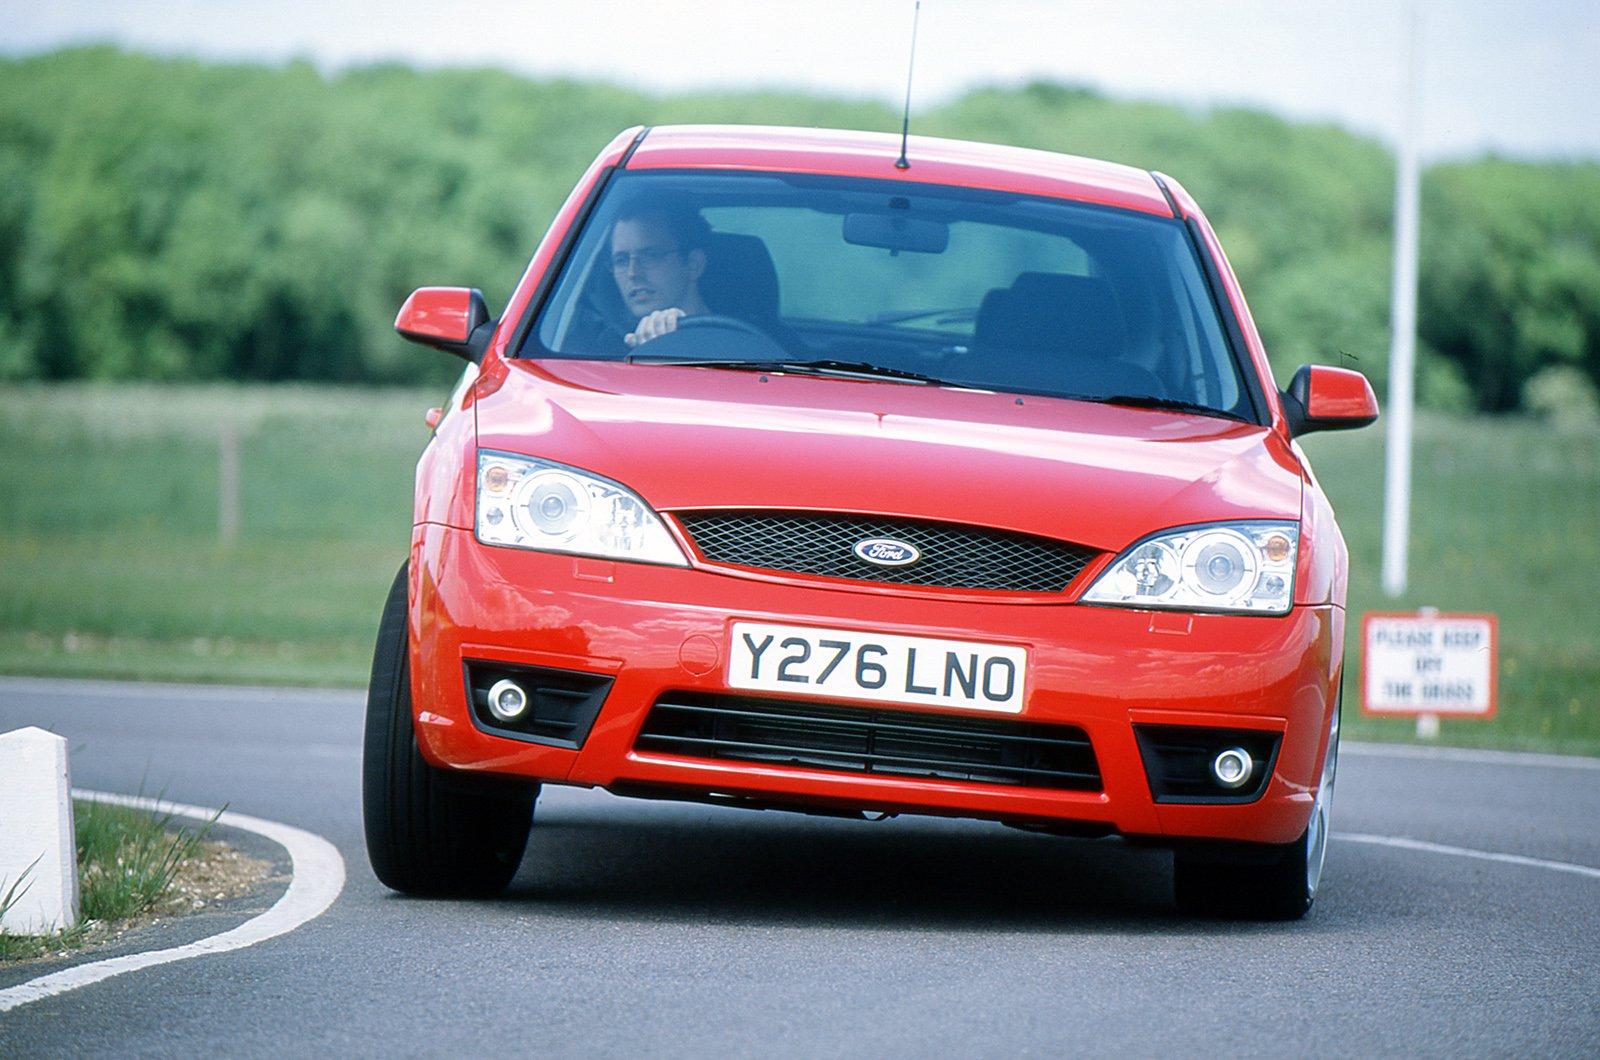 2001 Ford Mondeo V6